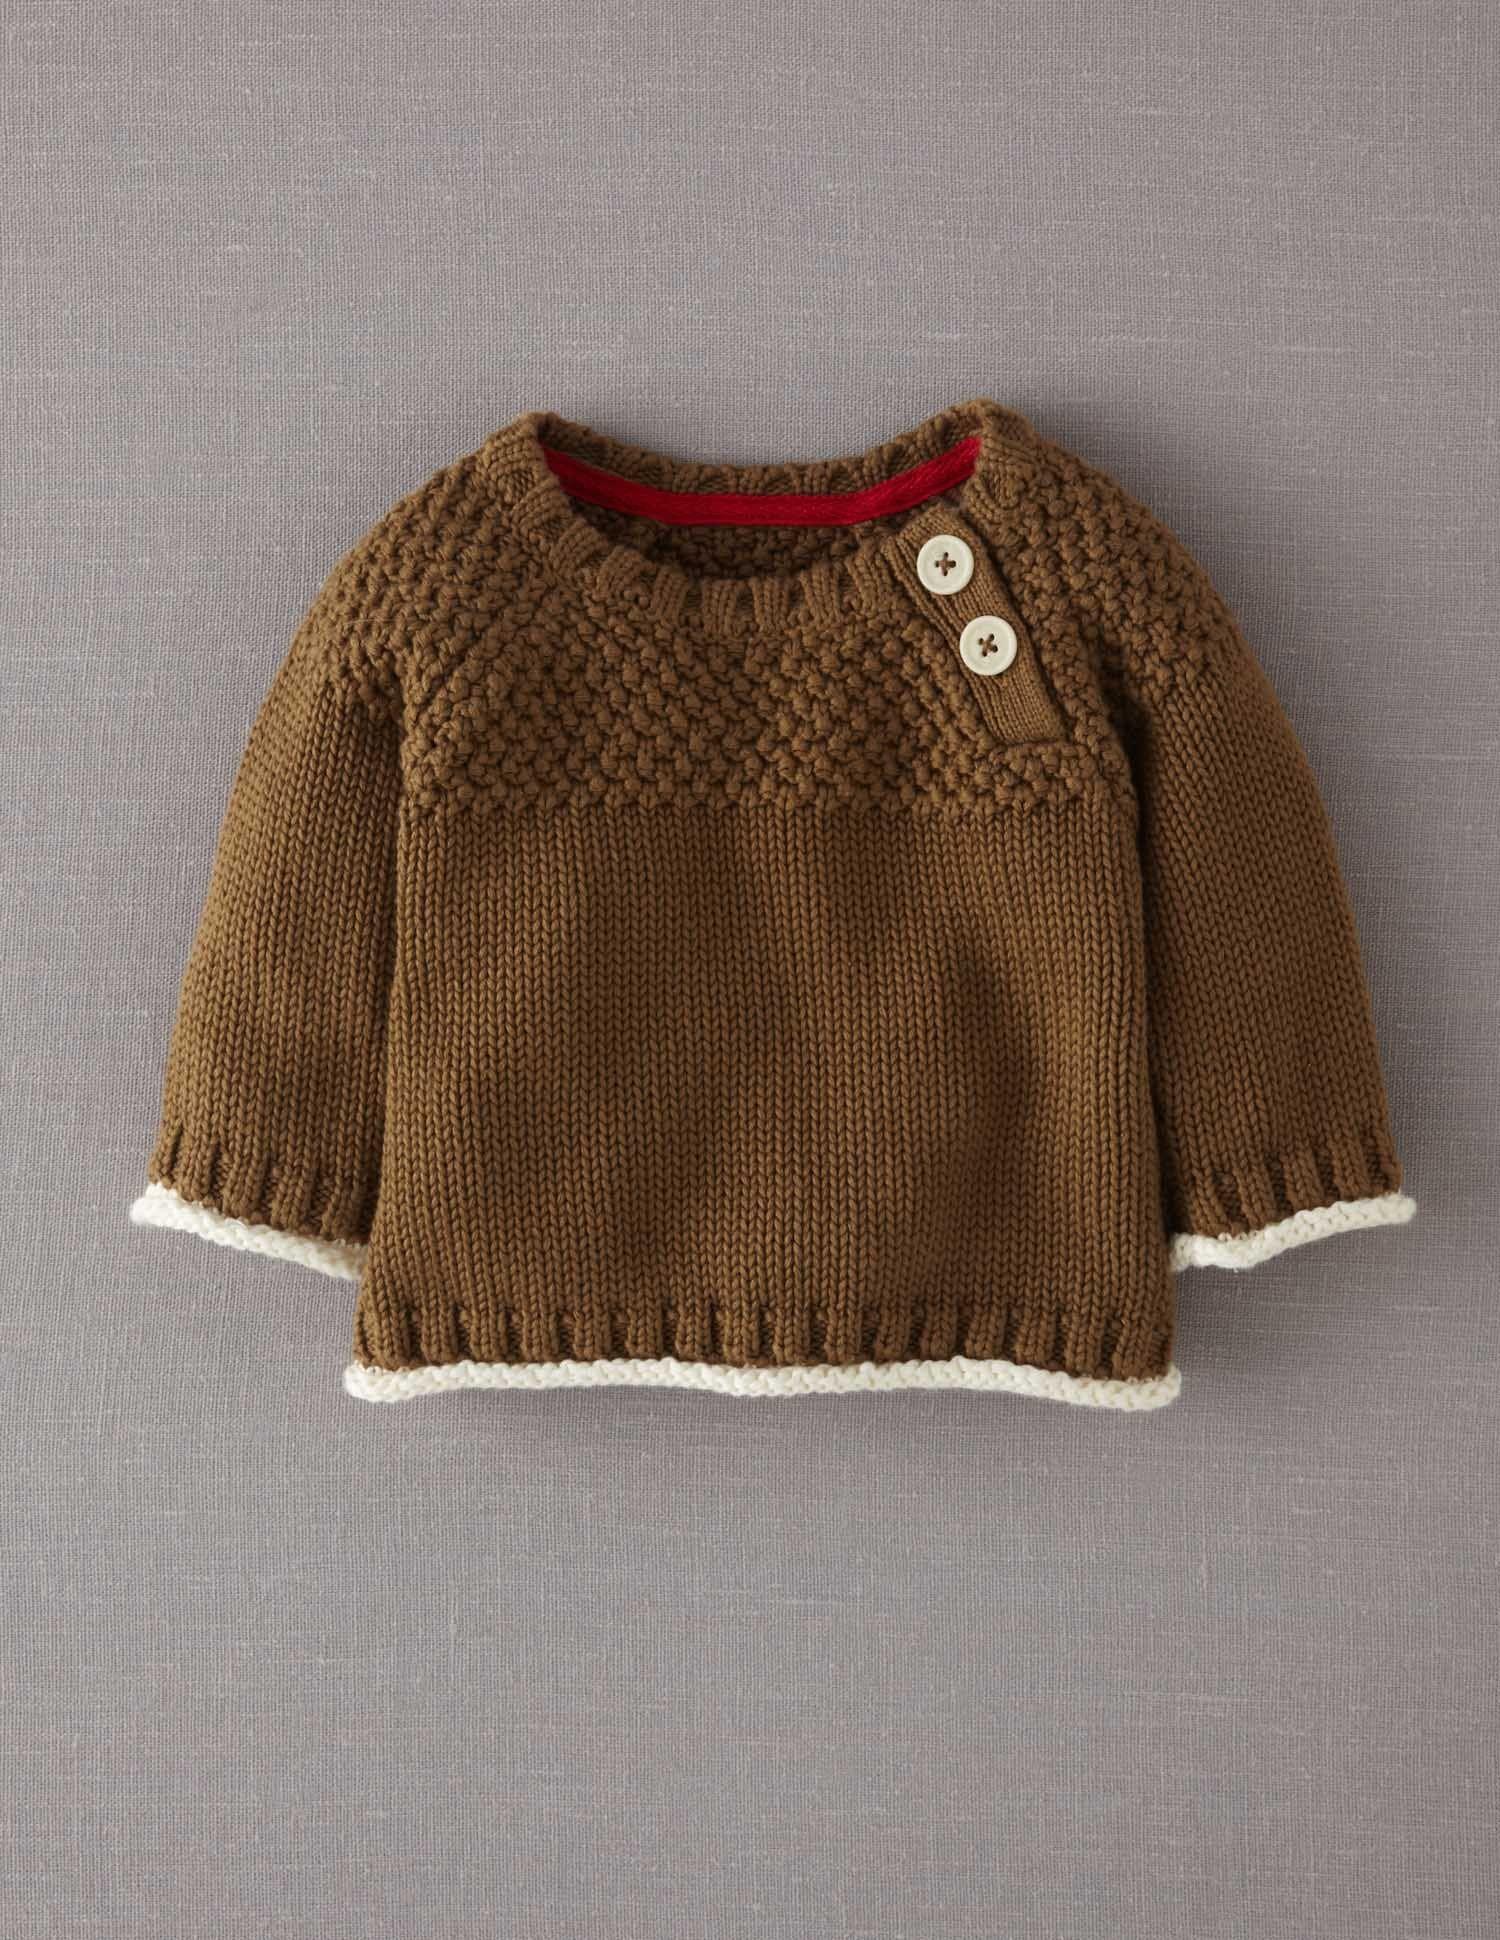 Pullover im Musterstrick | | деткам | Pinterest | Mini boden, Boden ...